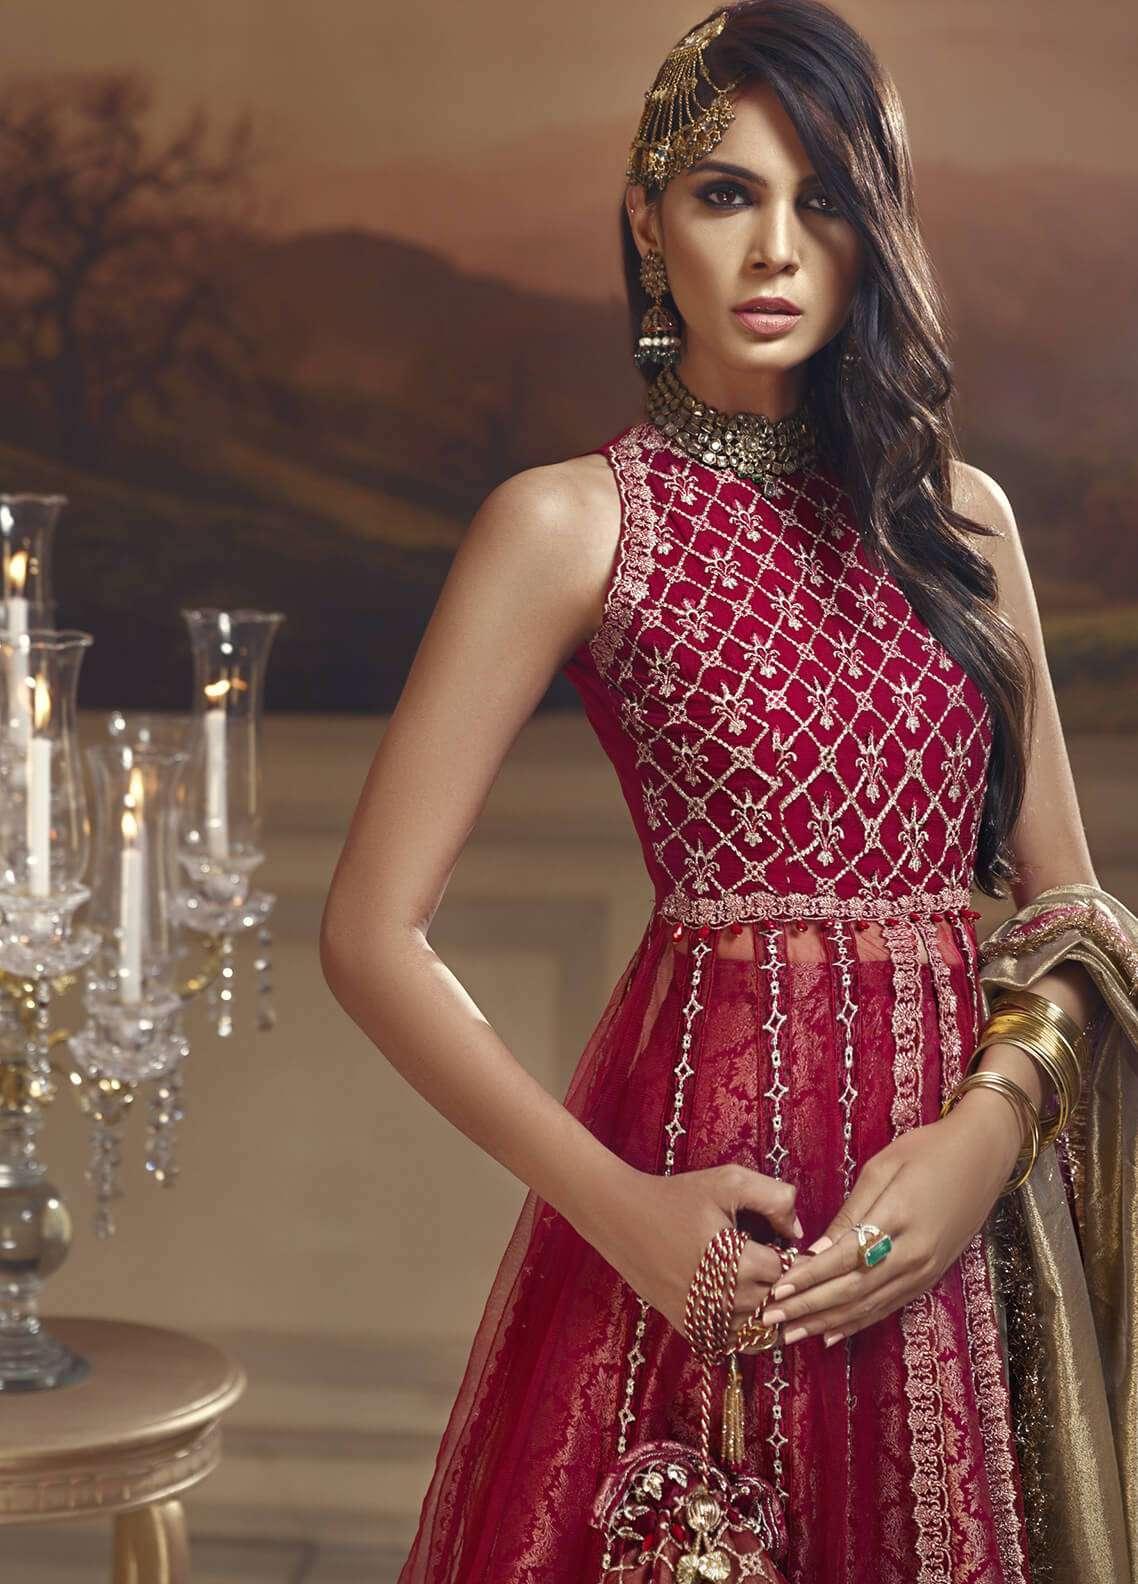 Anaya by Kiran Chaudhry Embroidered Chiffon Unstitched 3 Piece Suit AKC18W 02 - Wedding Edition